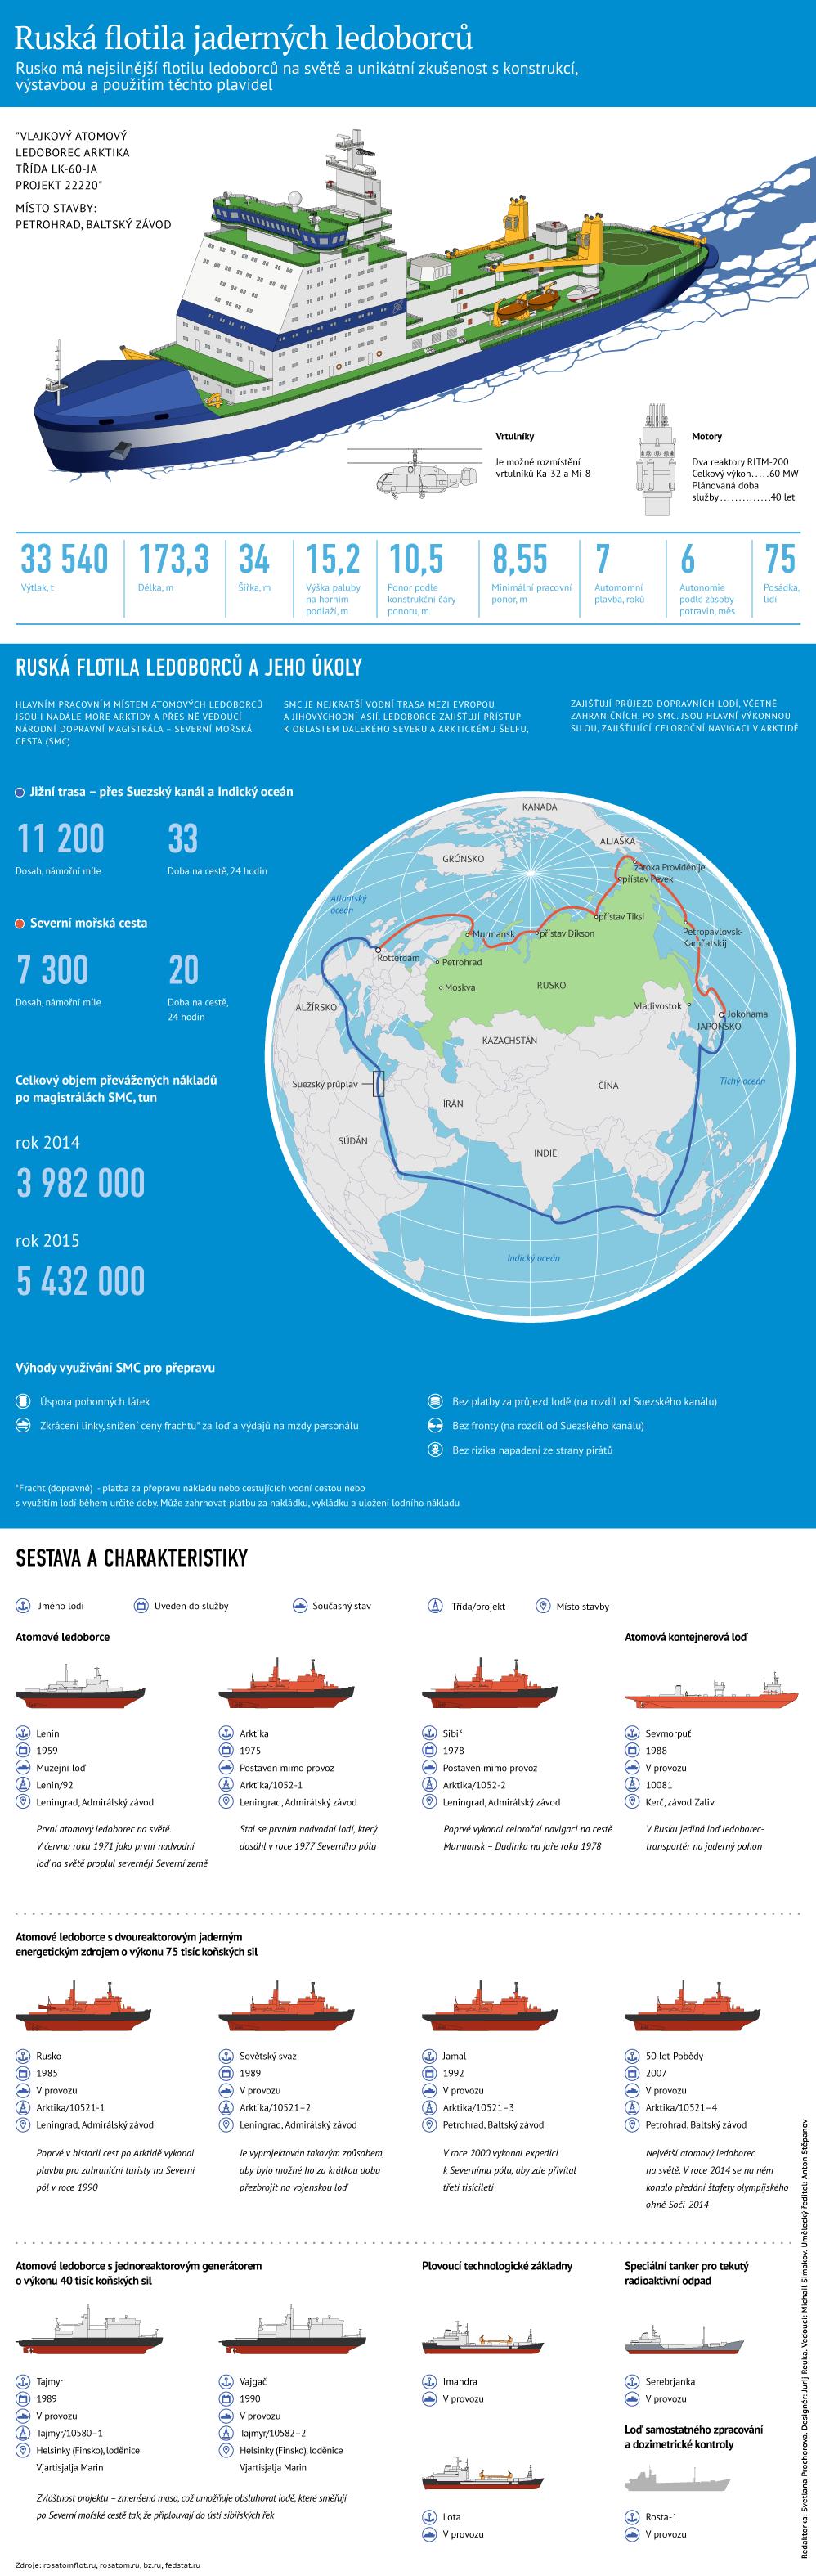 Charakteristiky a úkoly ledoborce Arktika